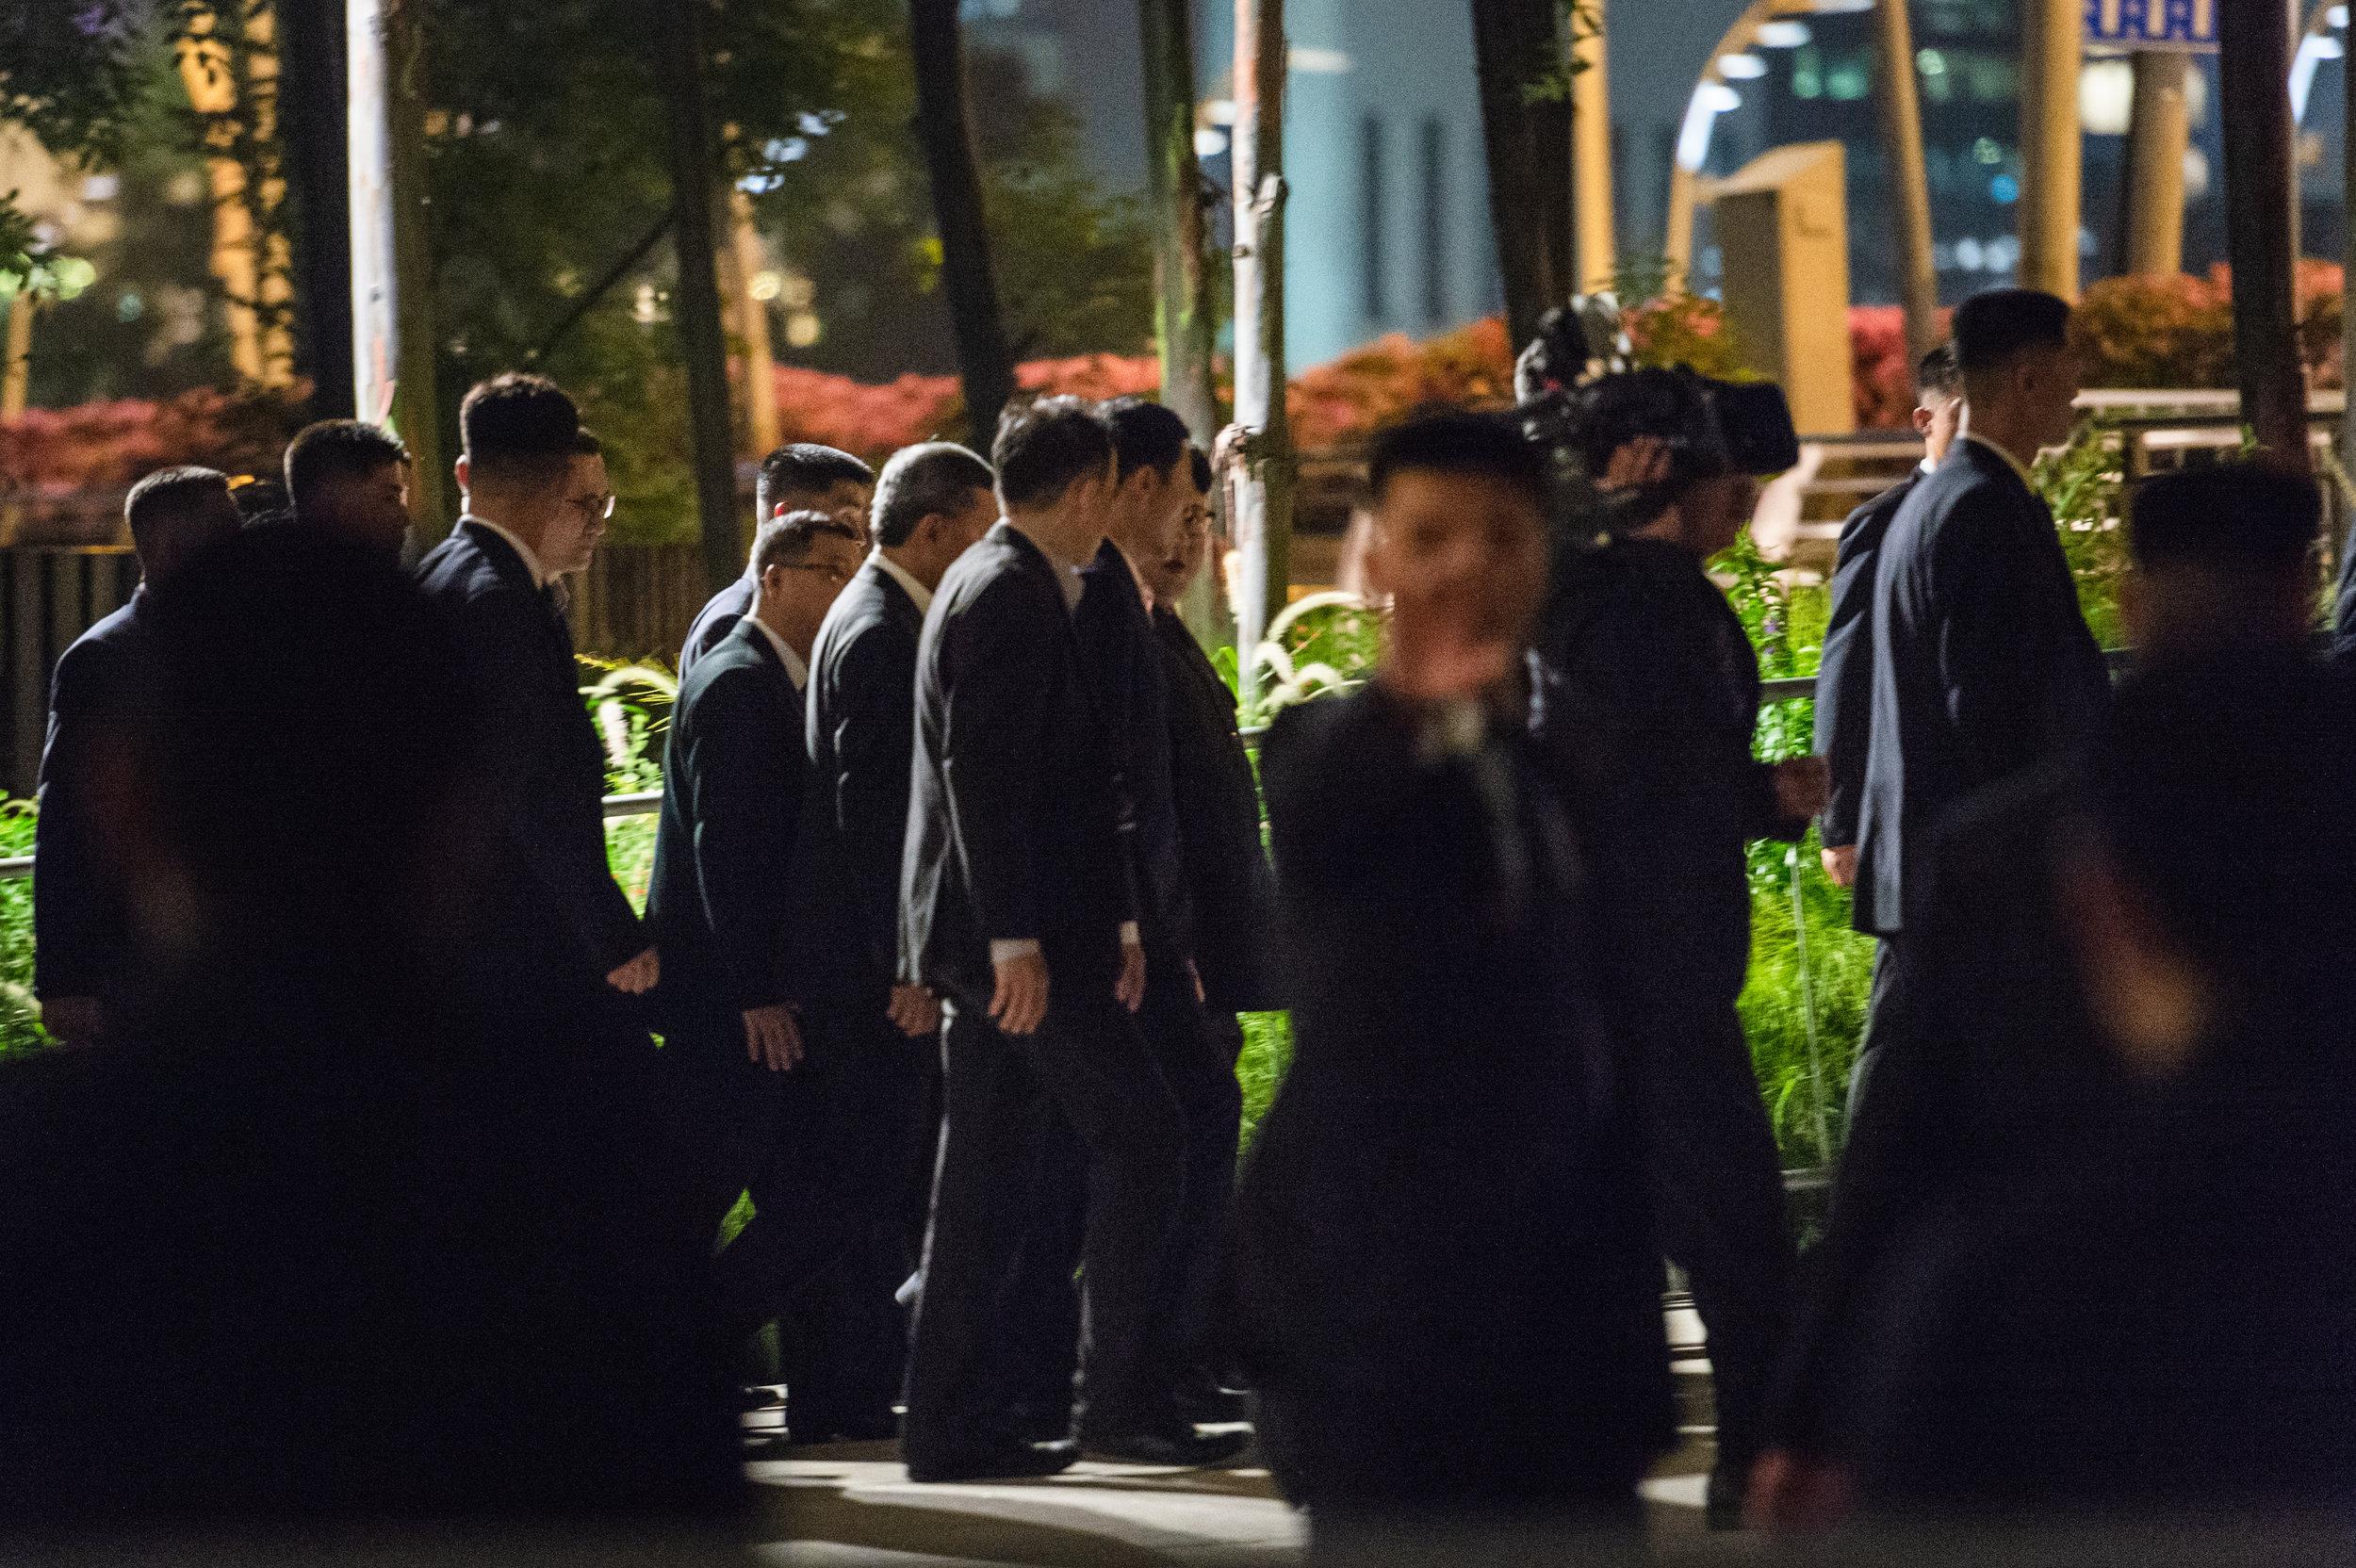 2018-06-11 - The Coincidental Kim Jong Un Esplanade Visit (9 of 11).jpg